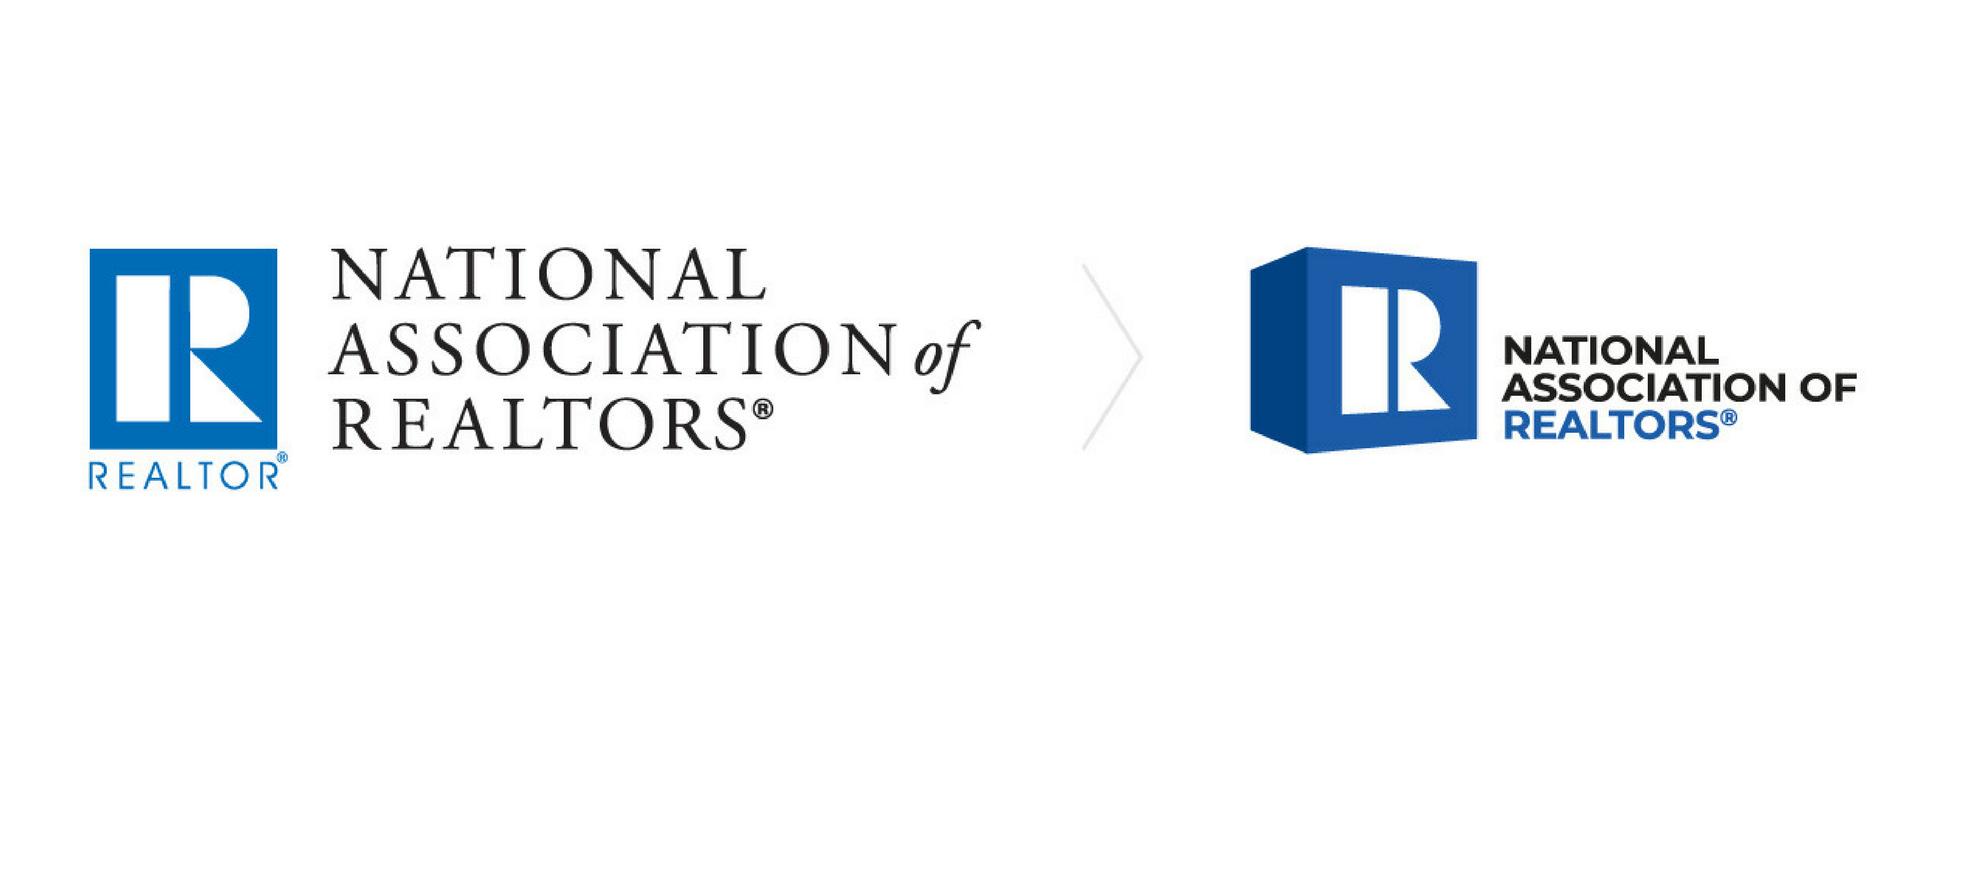 Realtors react to NAR's new threedimensional logo